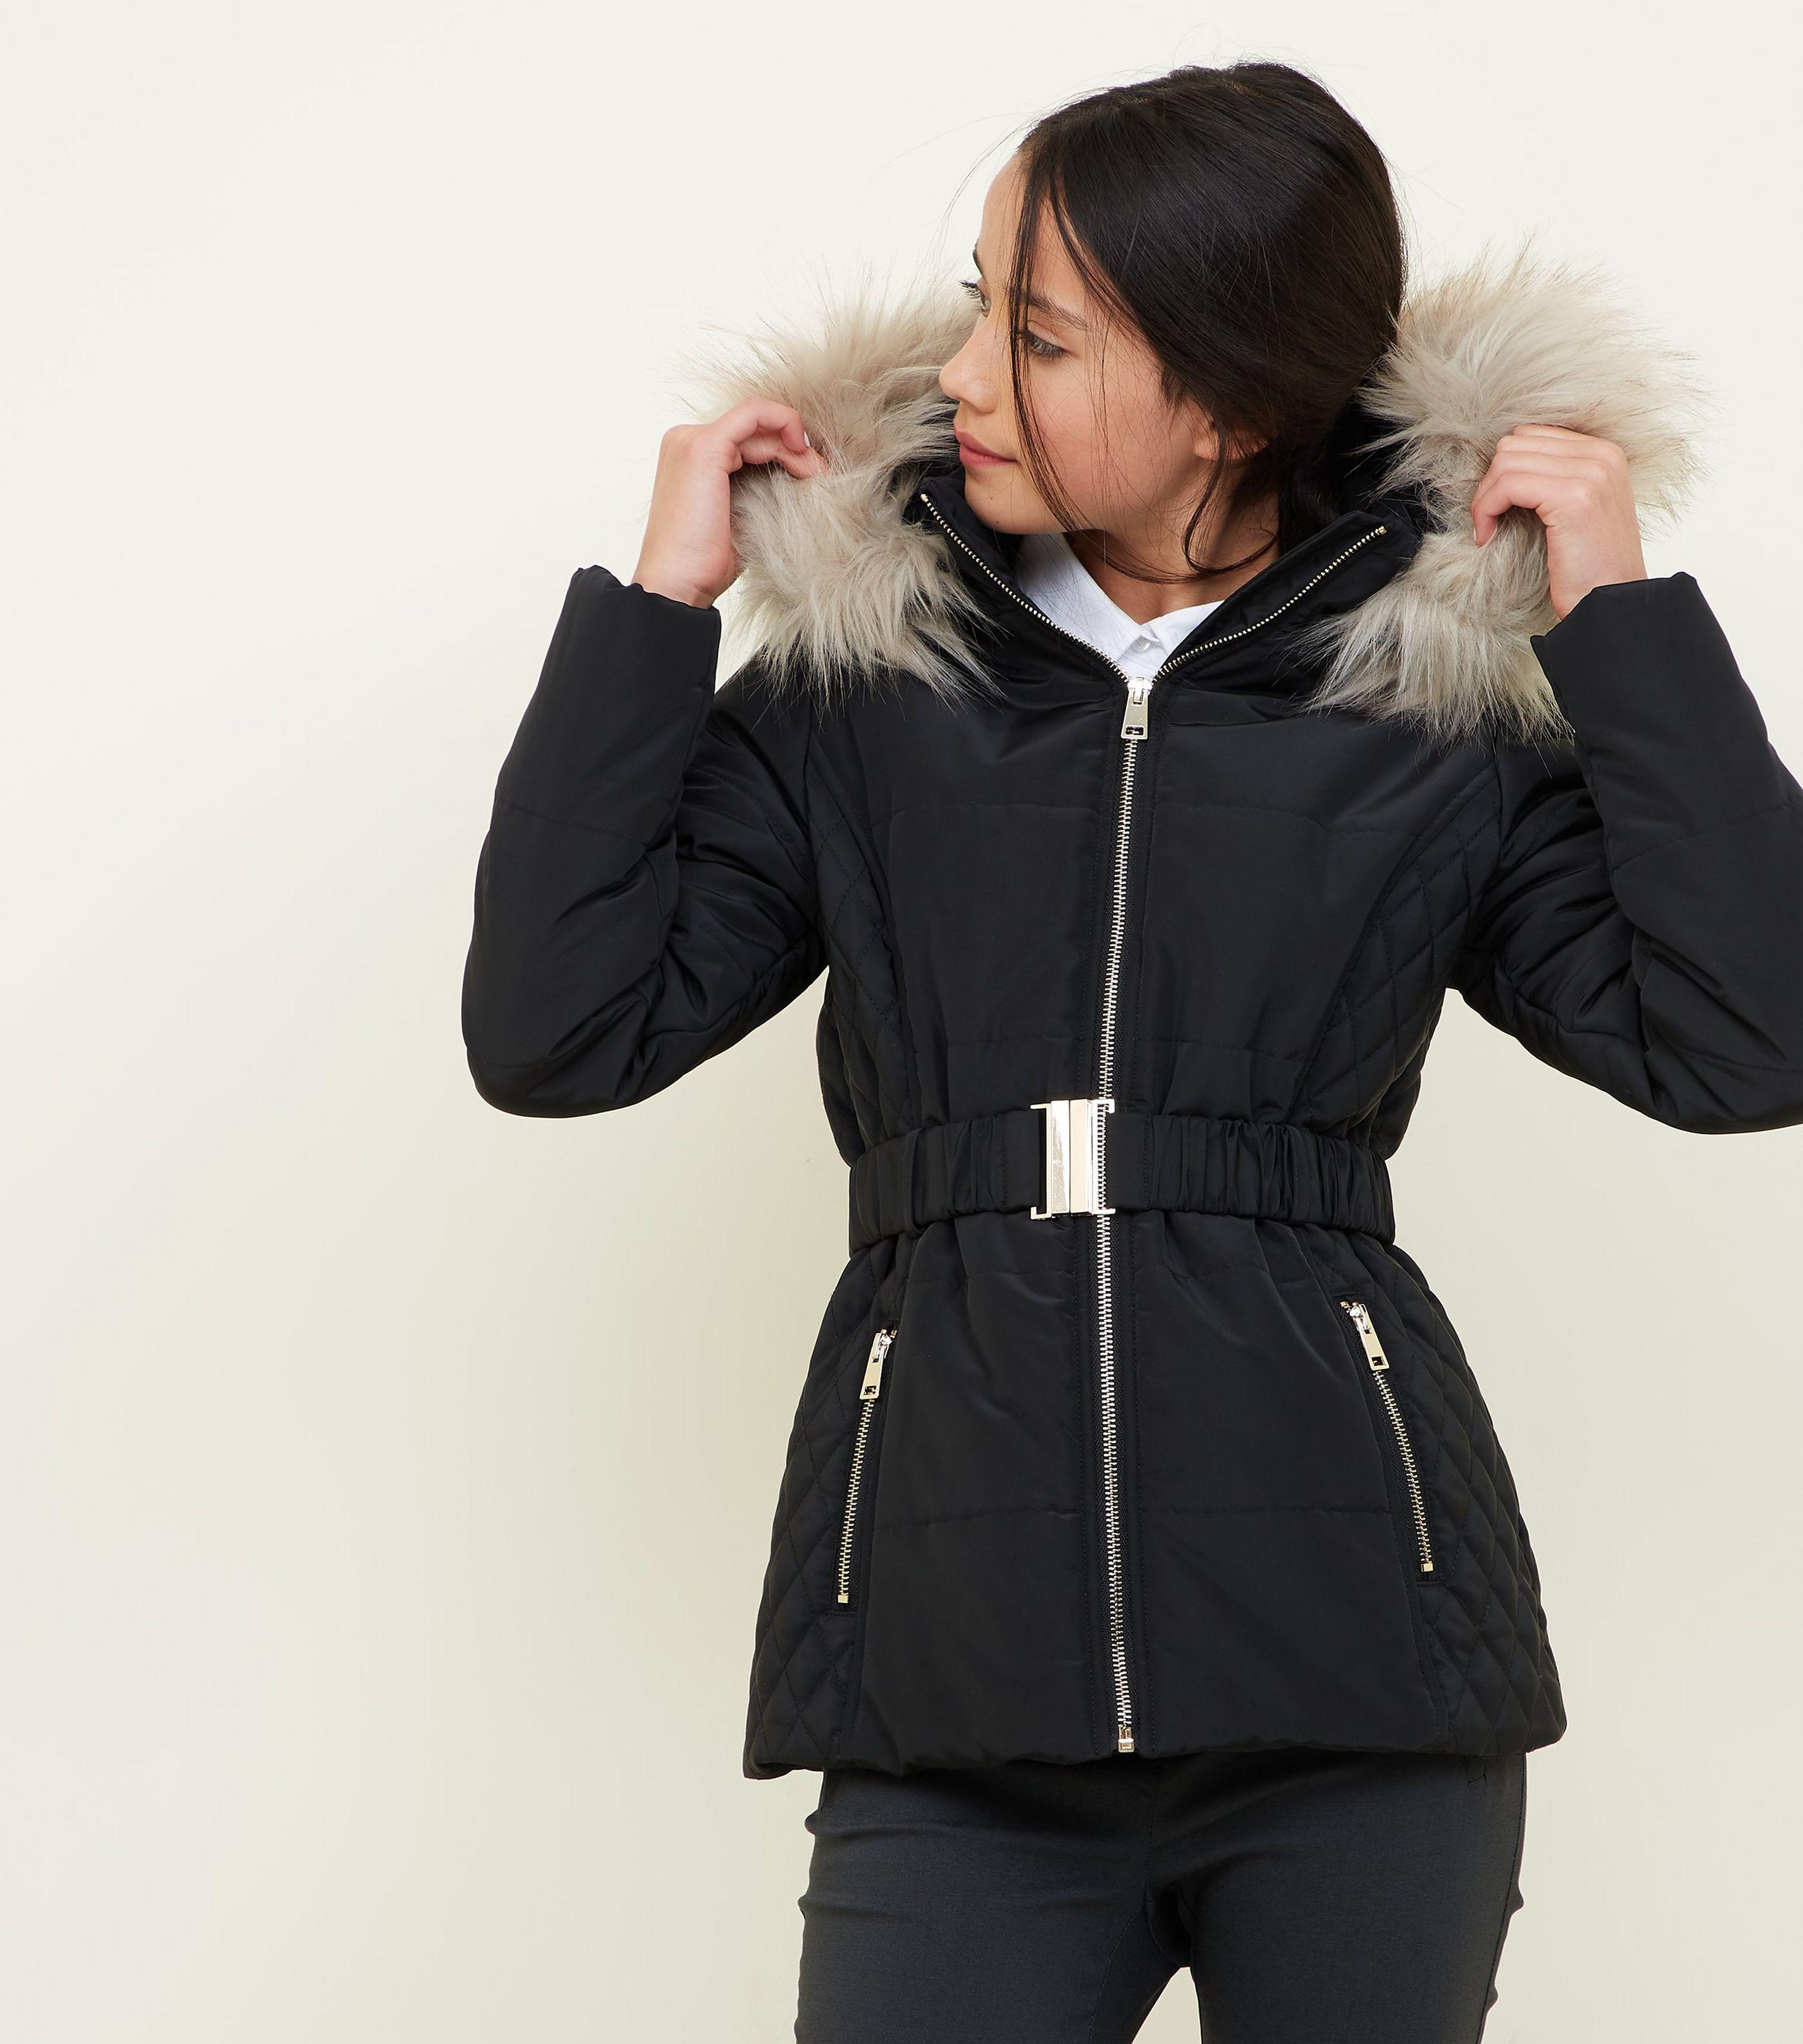 3959a3c5f New Look Girls Black Faux Fur Trim Hood Belted Puffer Jacket in ...